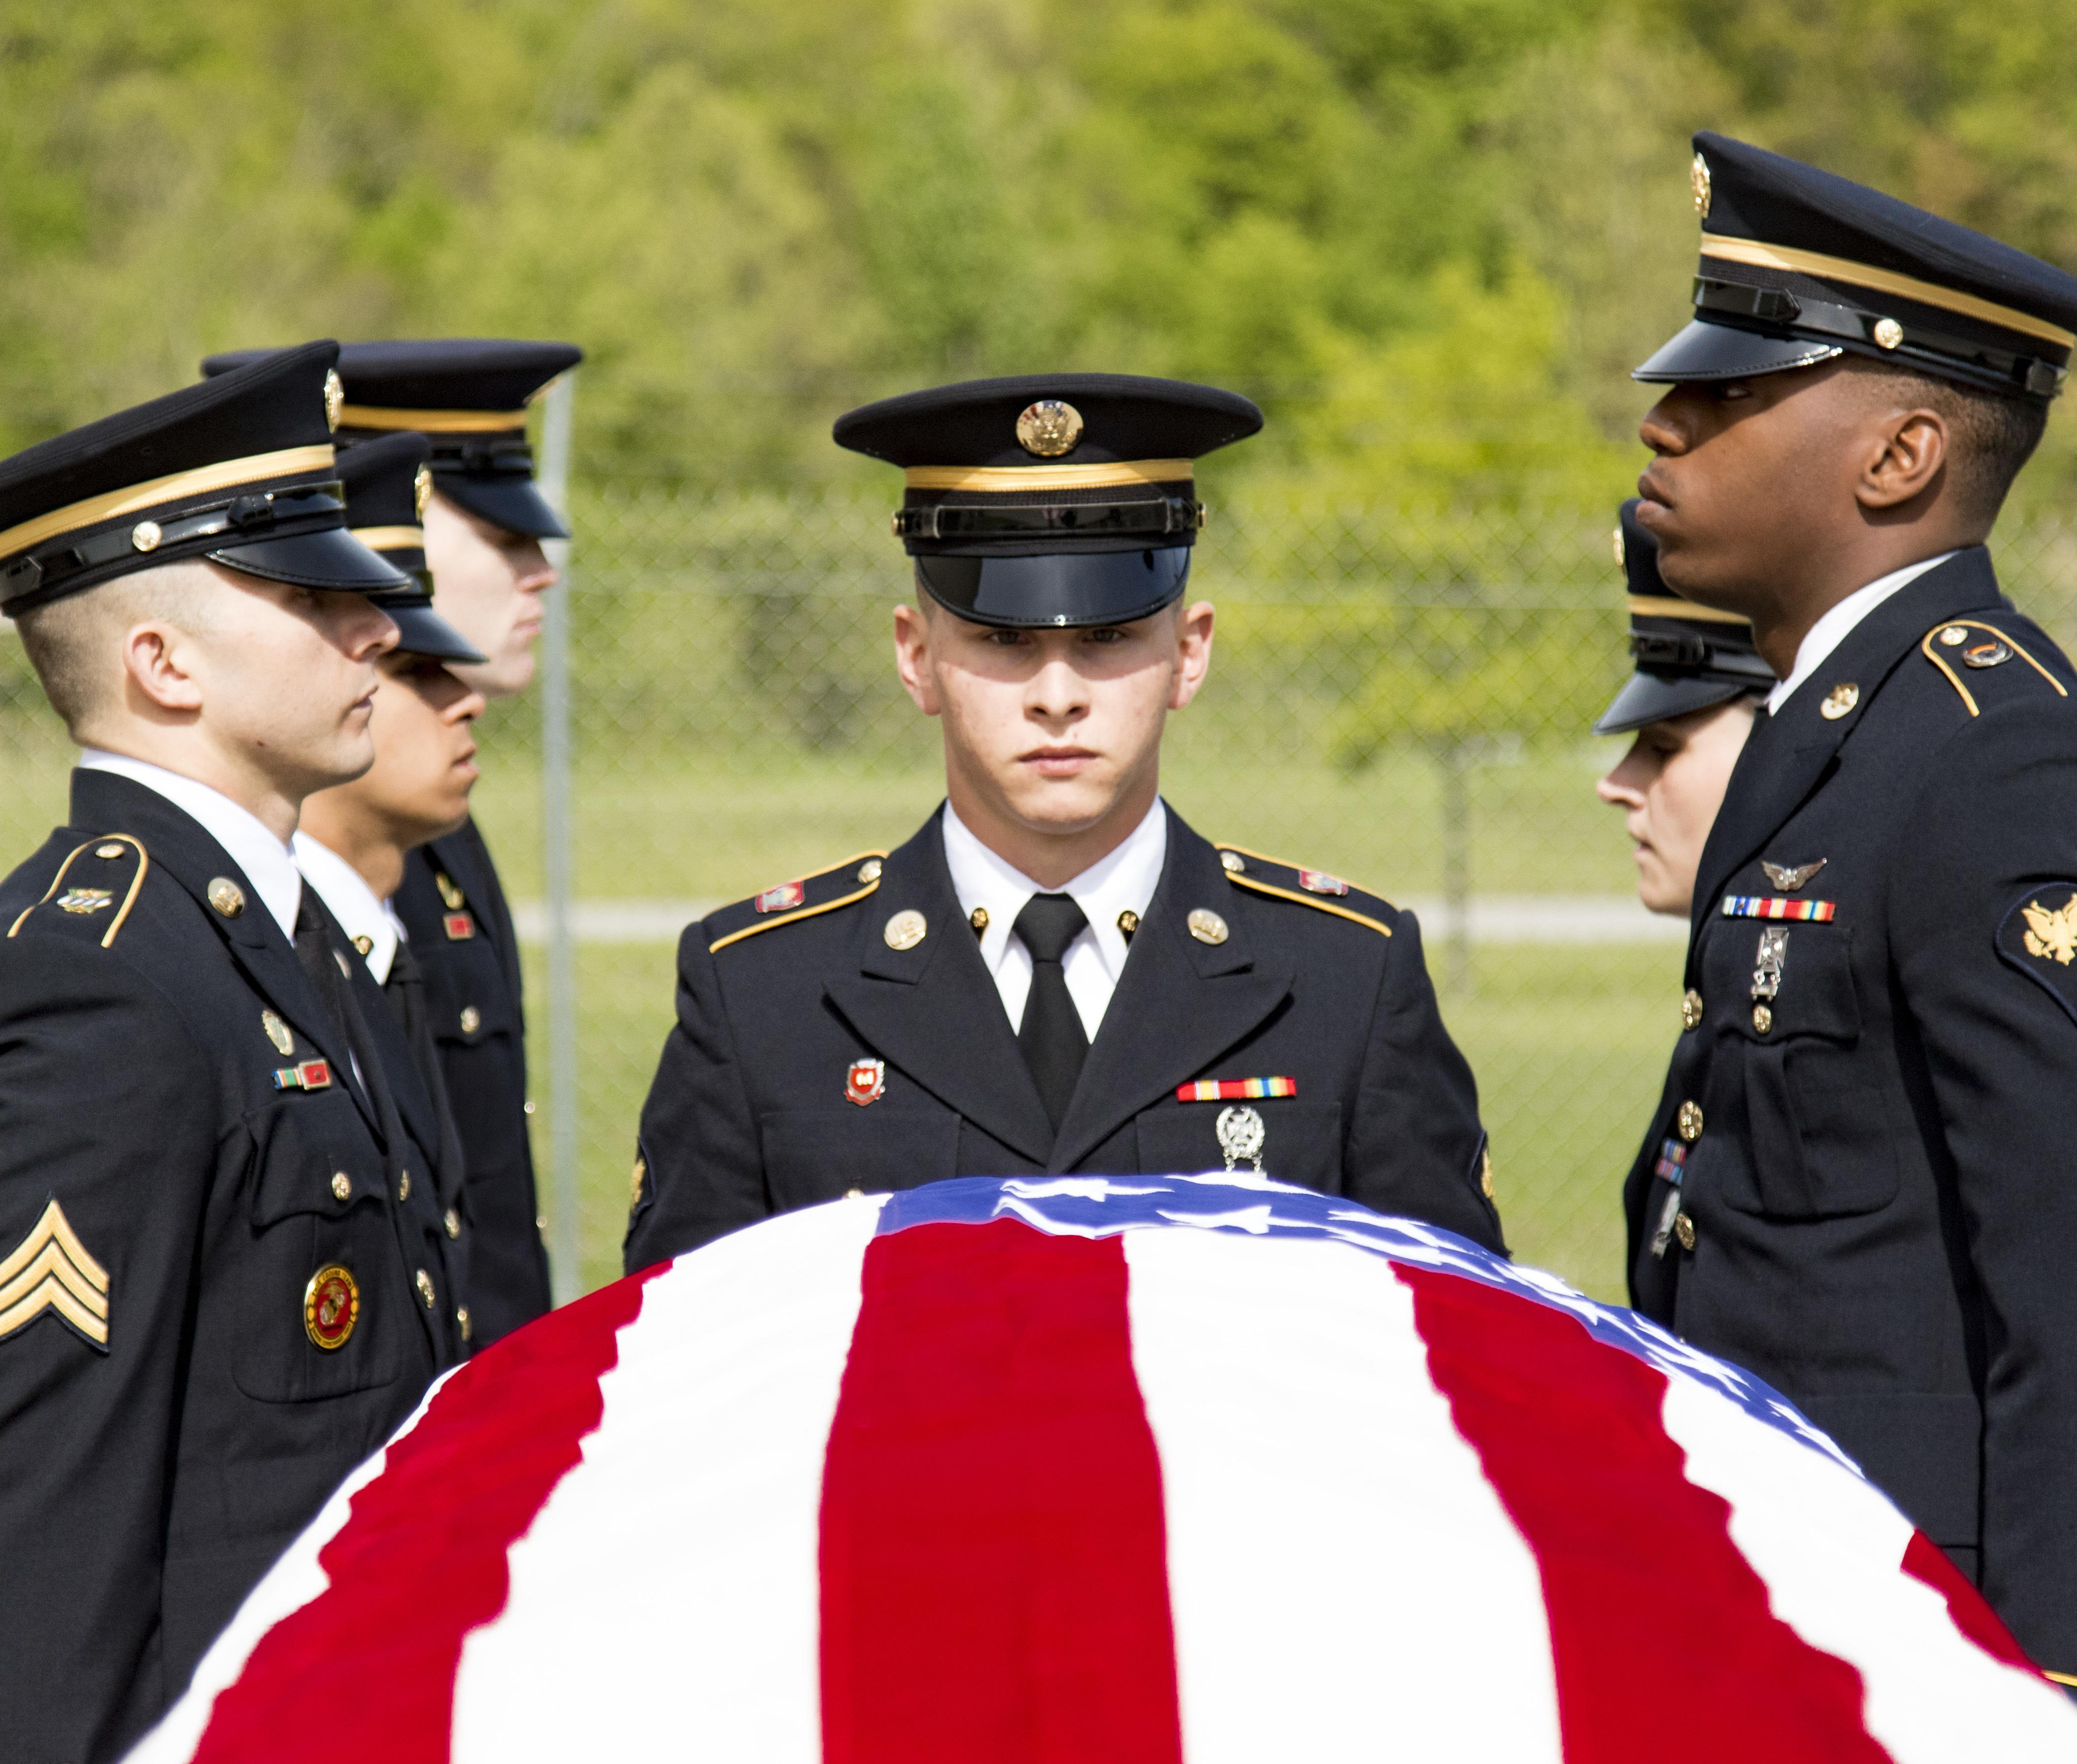 Army Guard funeral honor guard members hone advanced ...